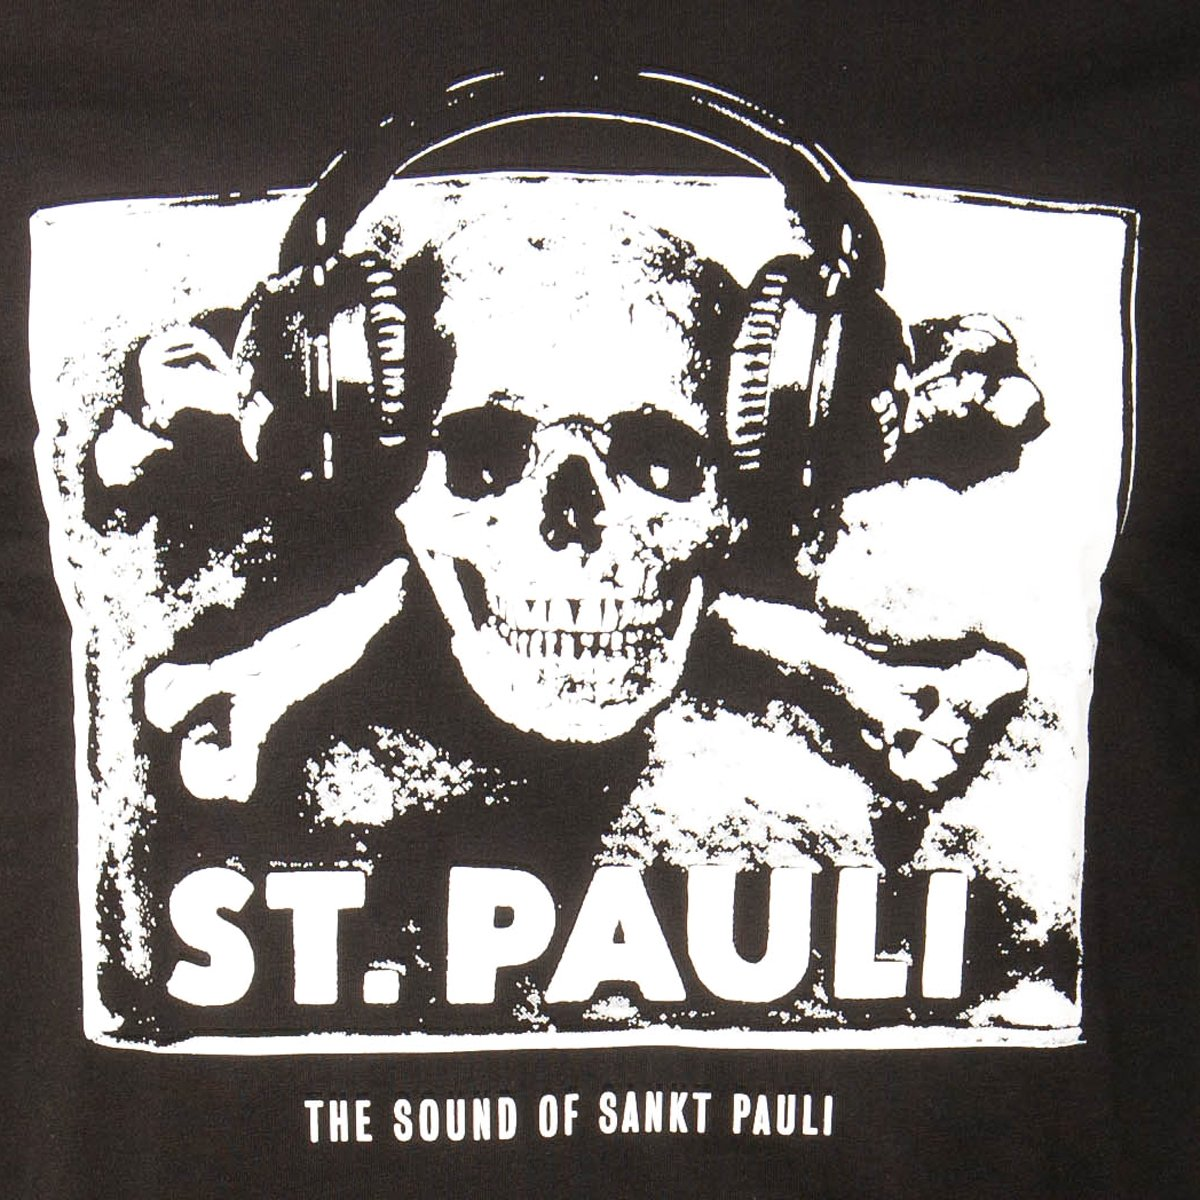 8a8b11ca20a01d FC St. Pauli Herren T-Shirt Fanartikel The Sound of Sankt Pauli ...